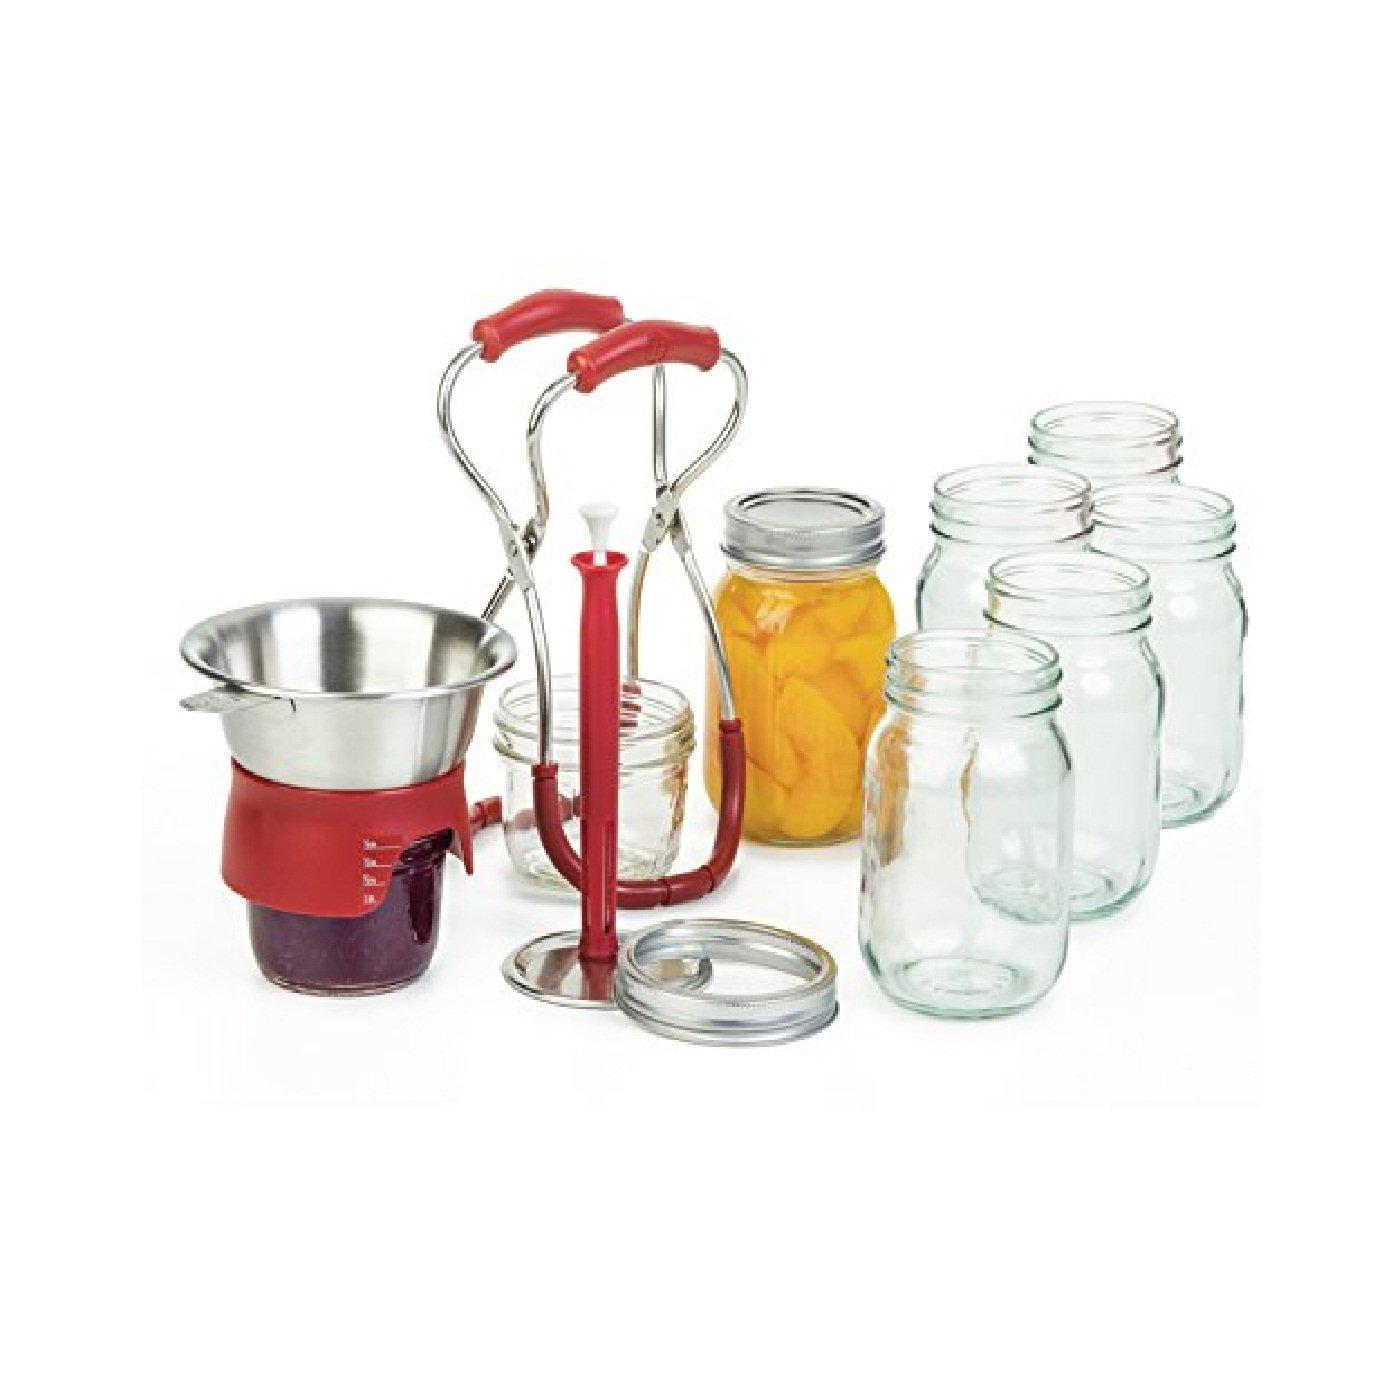 PL8 Canning Set PL8 4500 by PL8